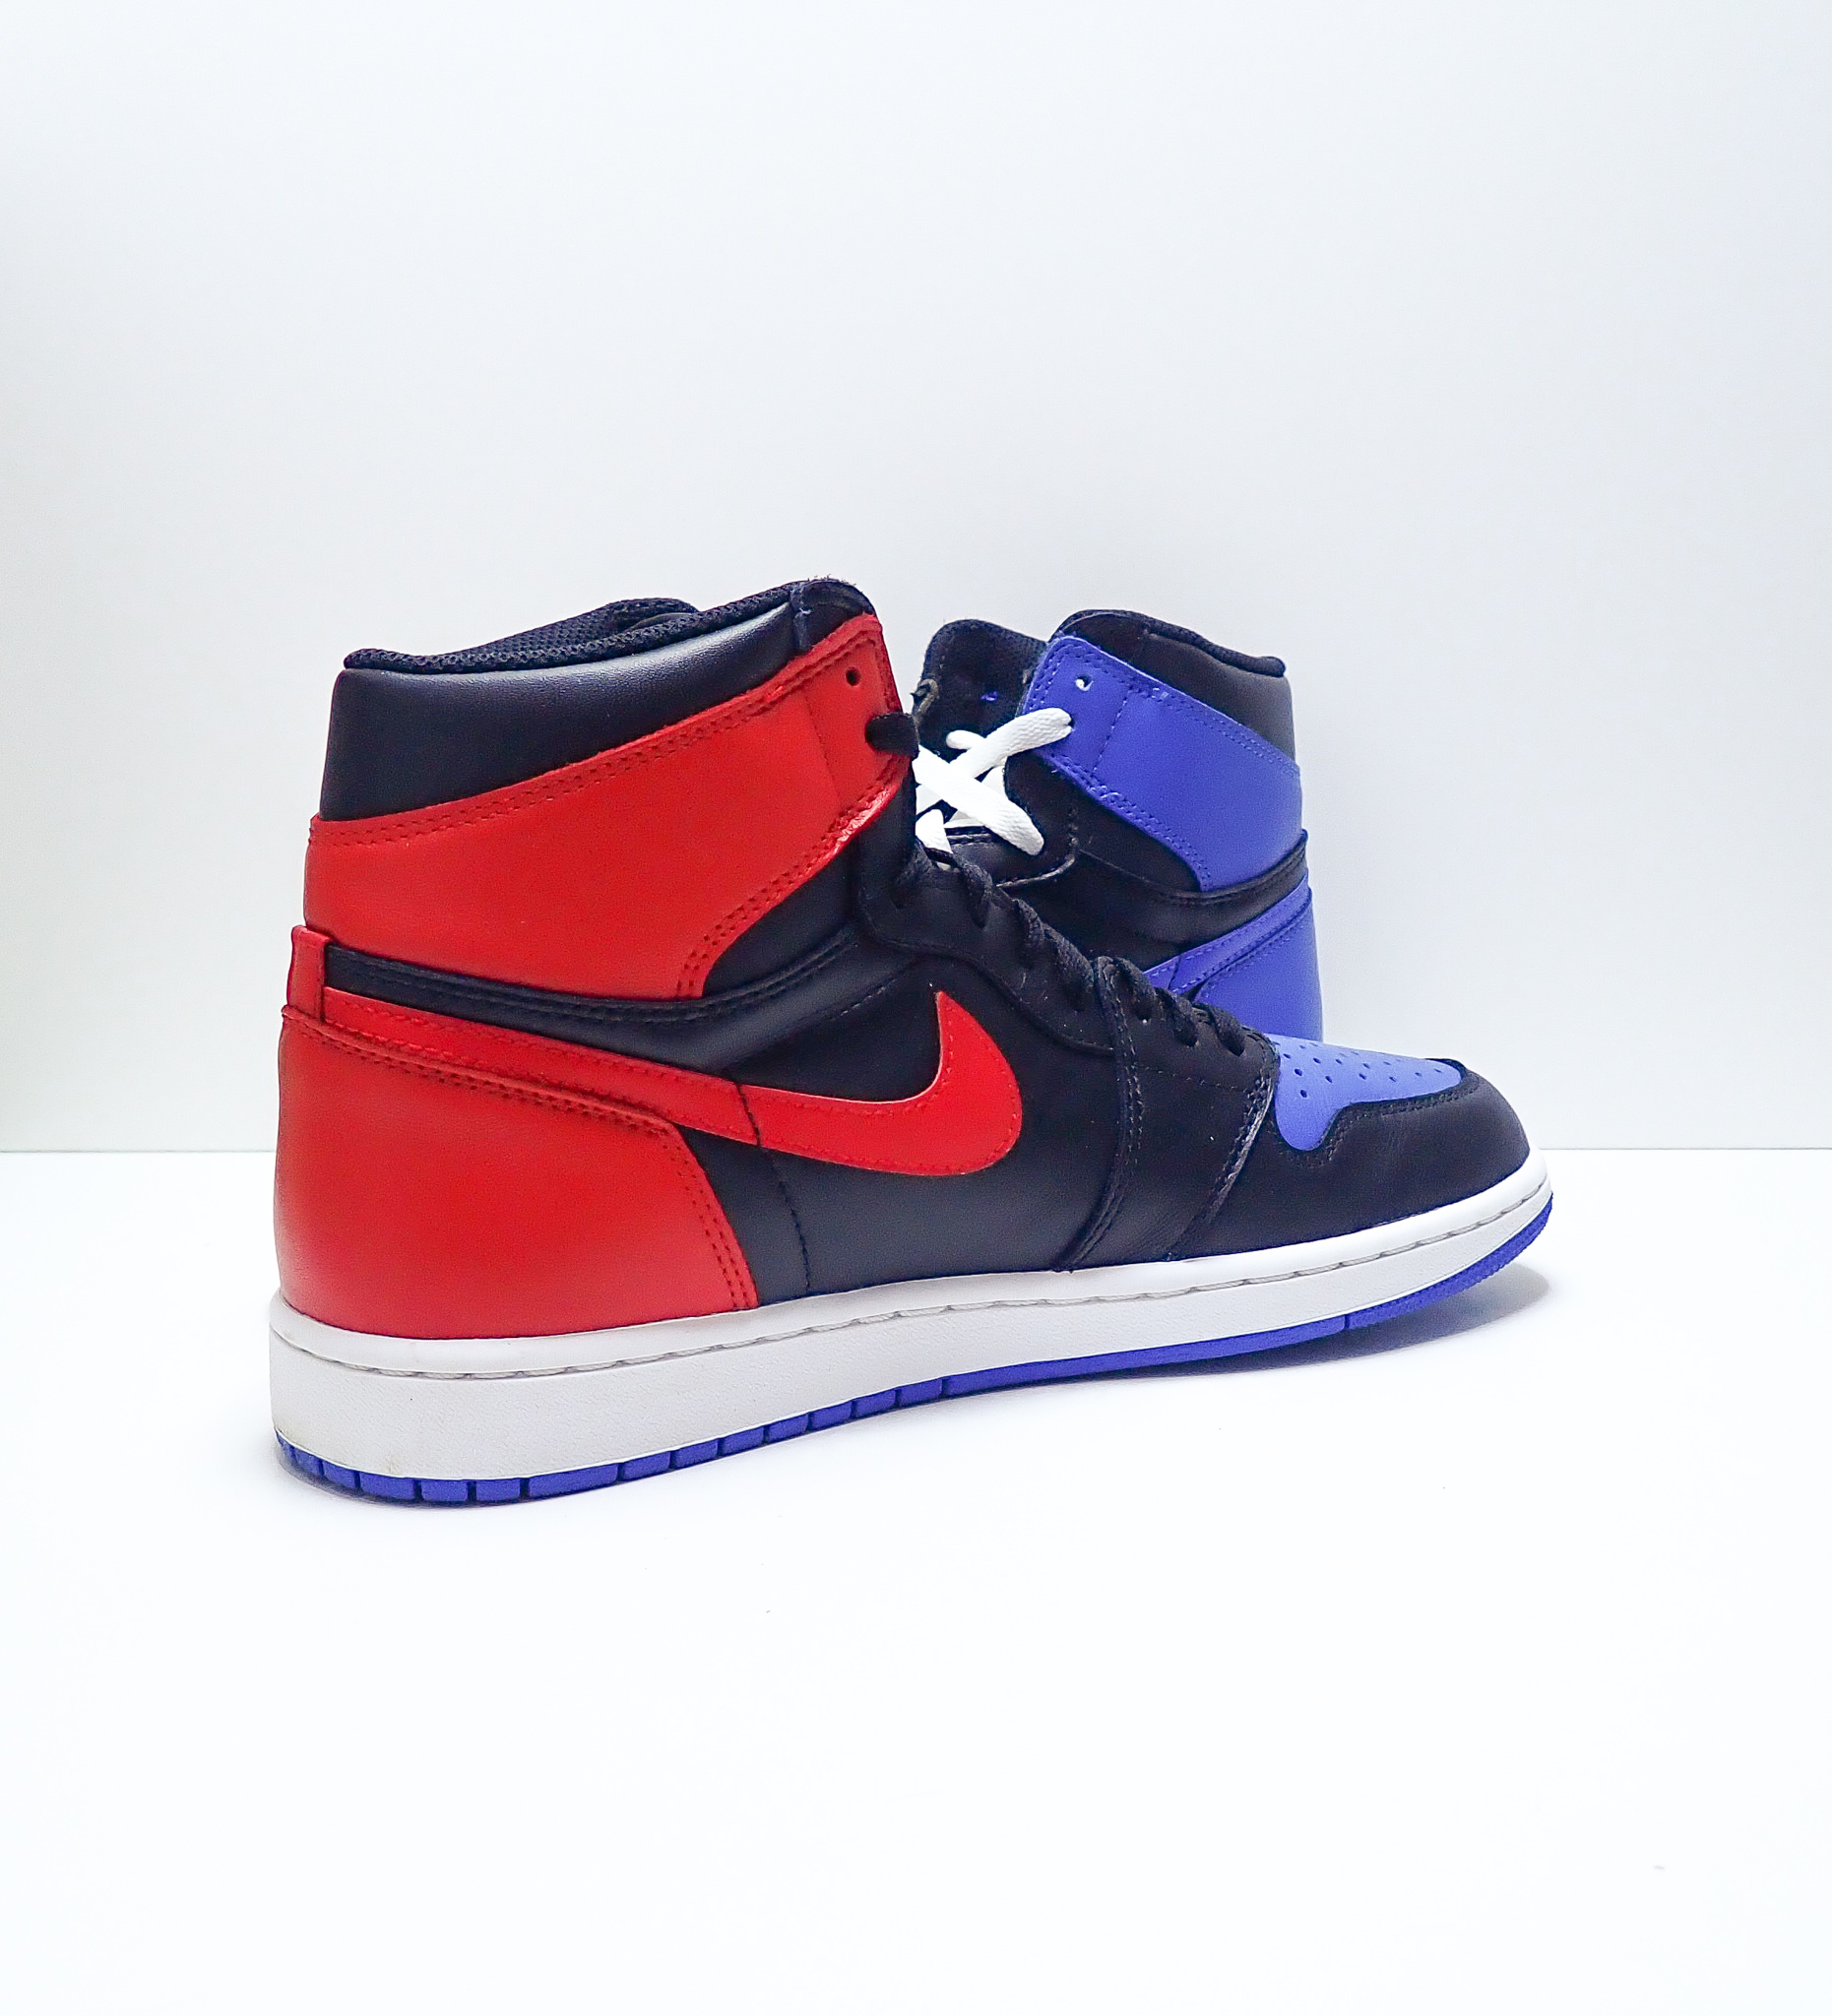 Jordan 1 Retro Top 3